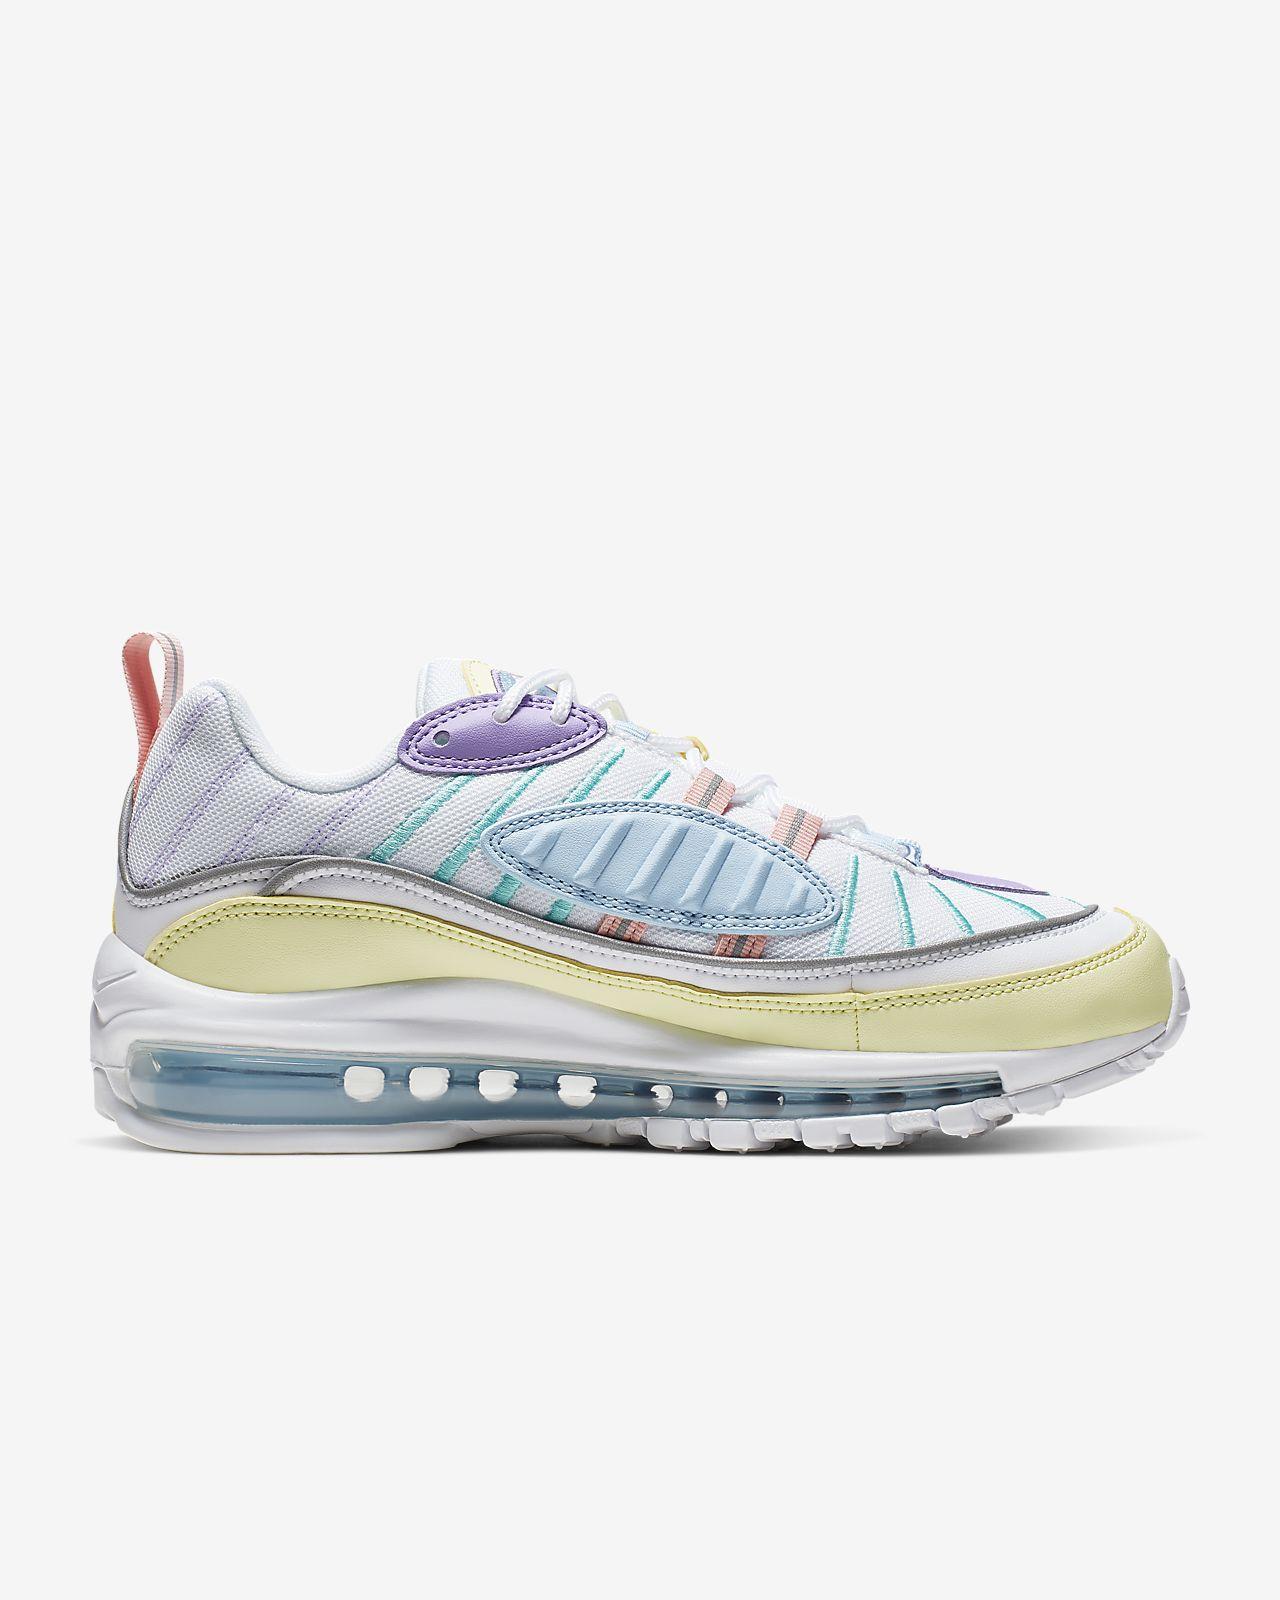 official photos 23c63 8195d Nike Air Max 98 Women's Shoe